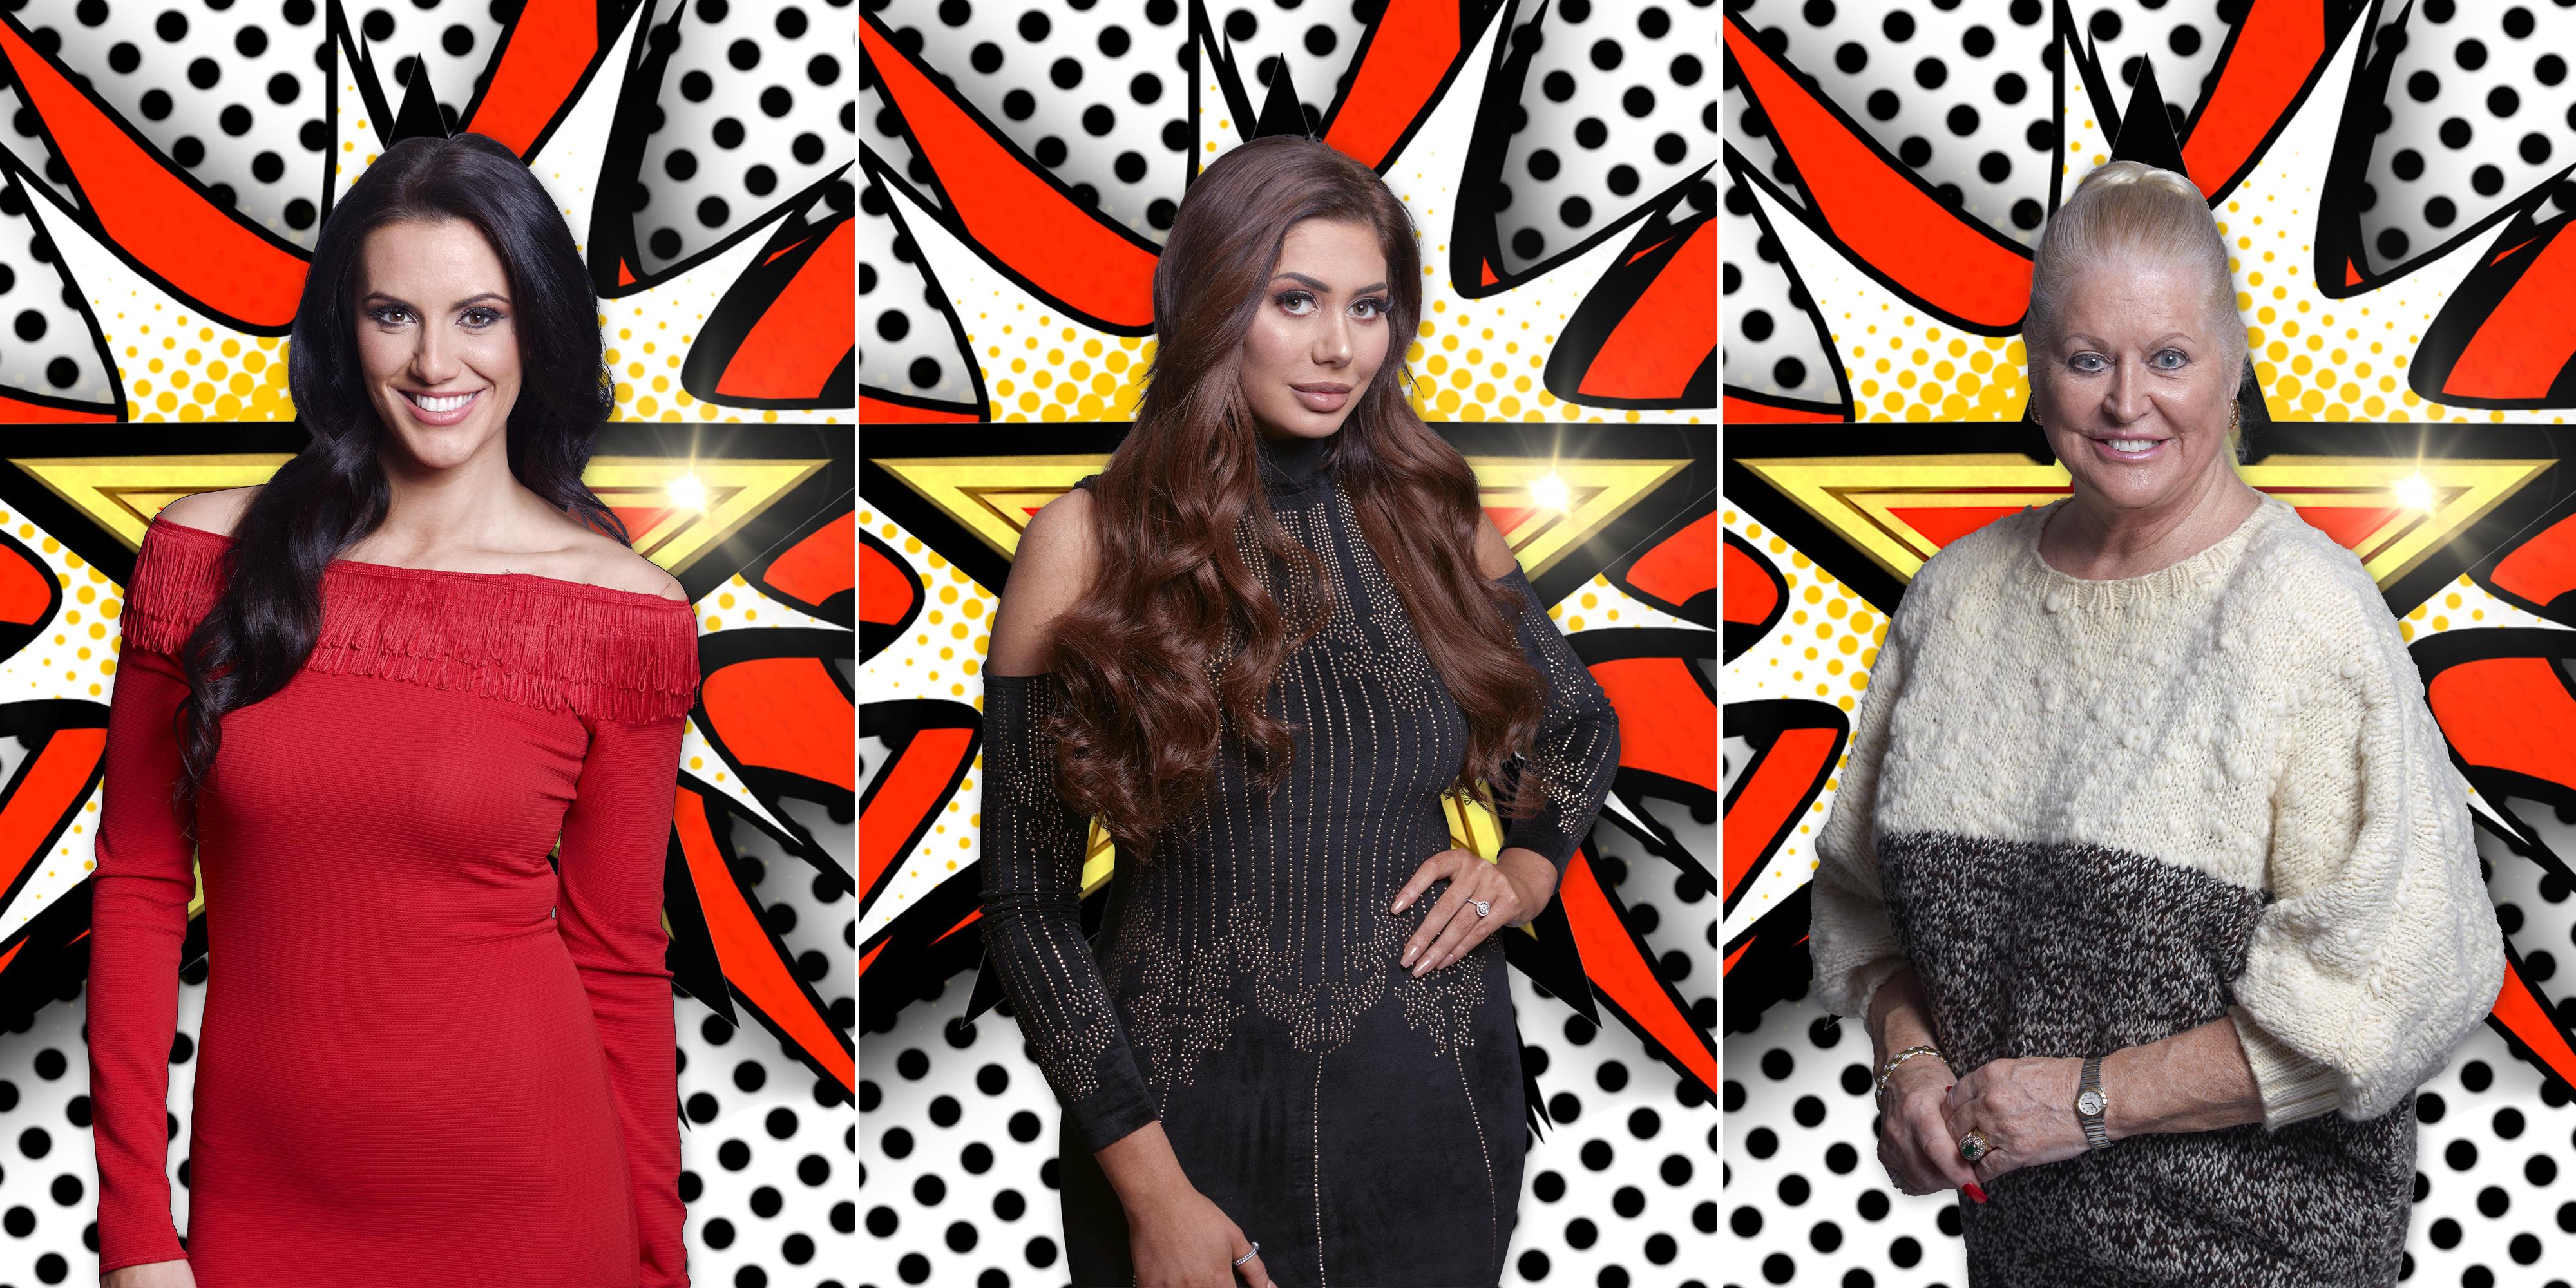 Meet the three new Celebrity Big Brother housemates